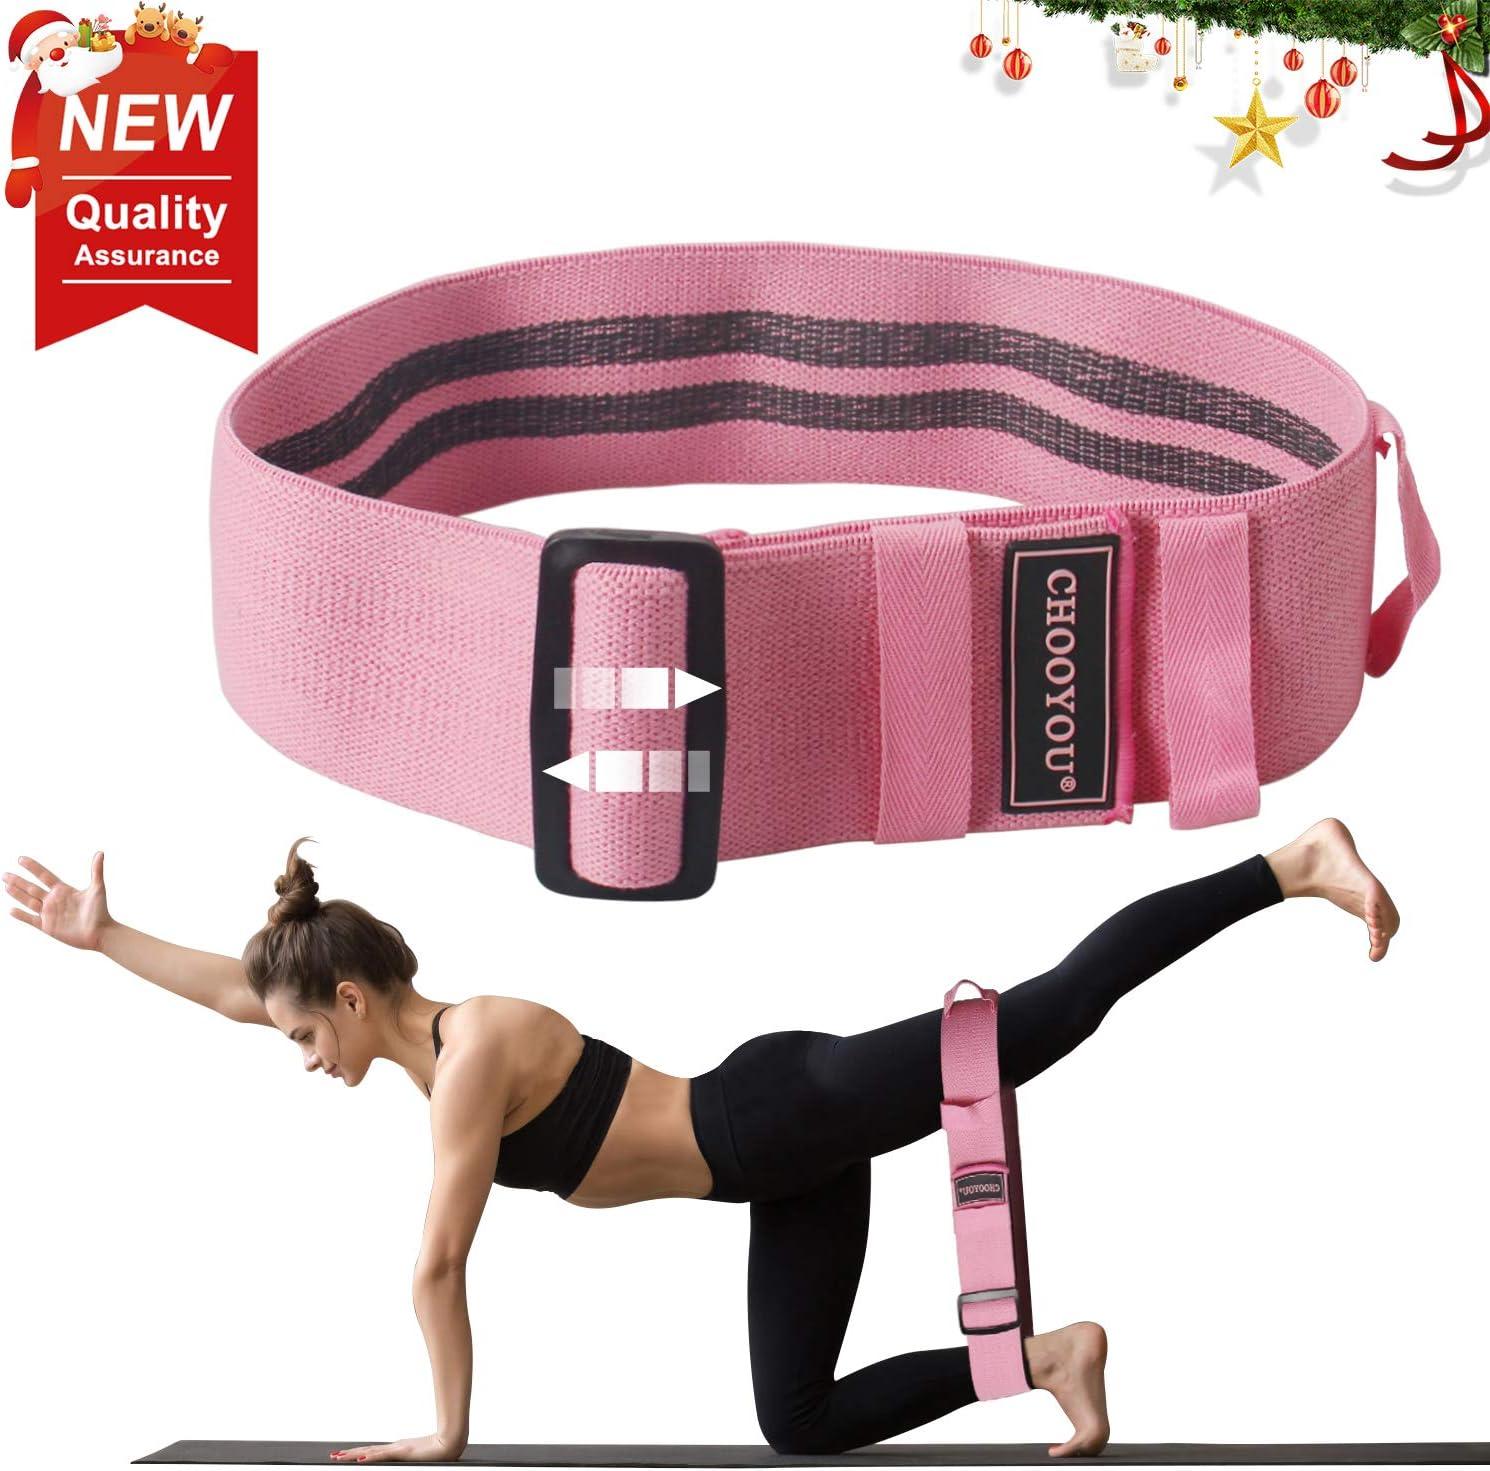 Bandes de Résistance Non Slip Booty Latex Boucle Bandes Exercice Yoga Pilates Jambe Squat